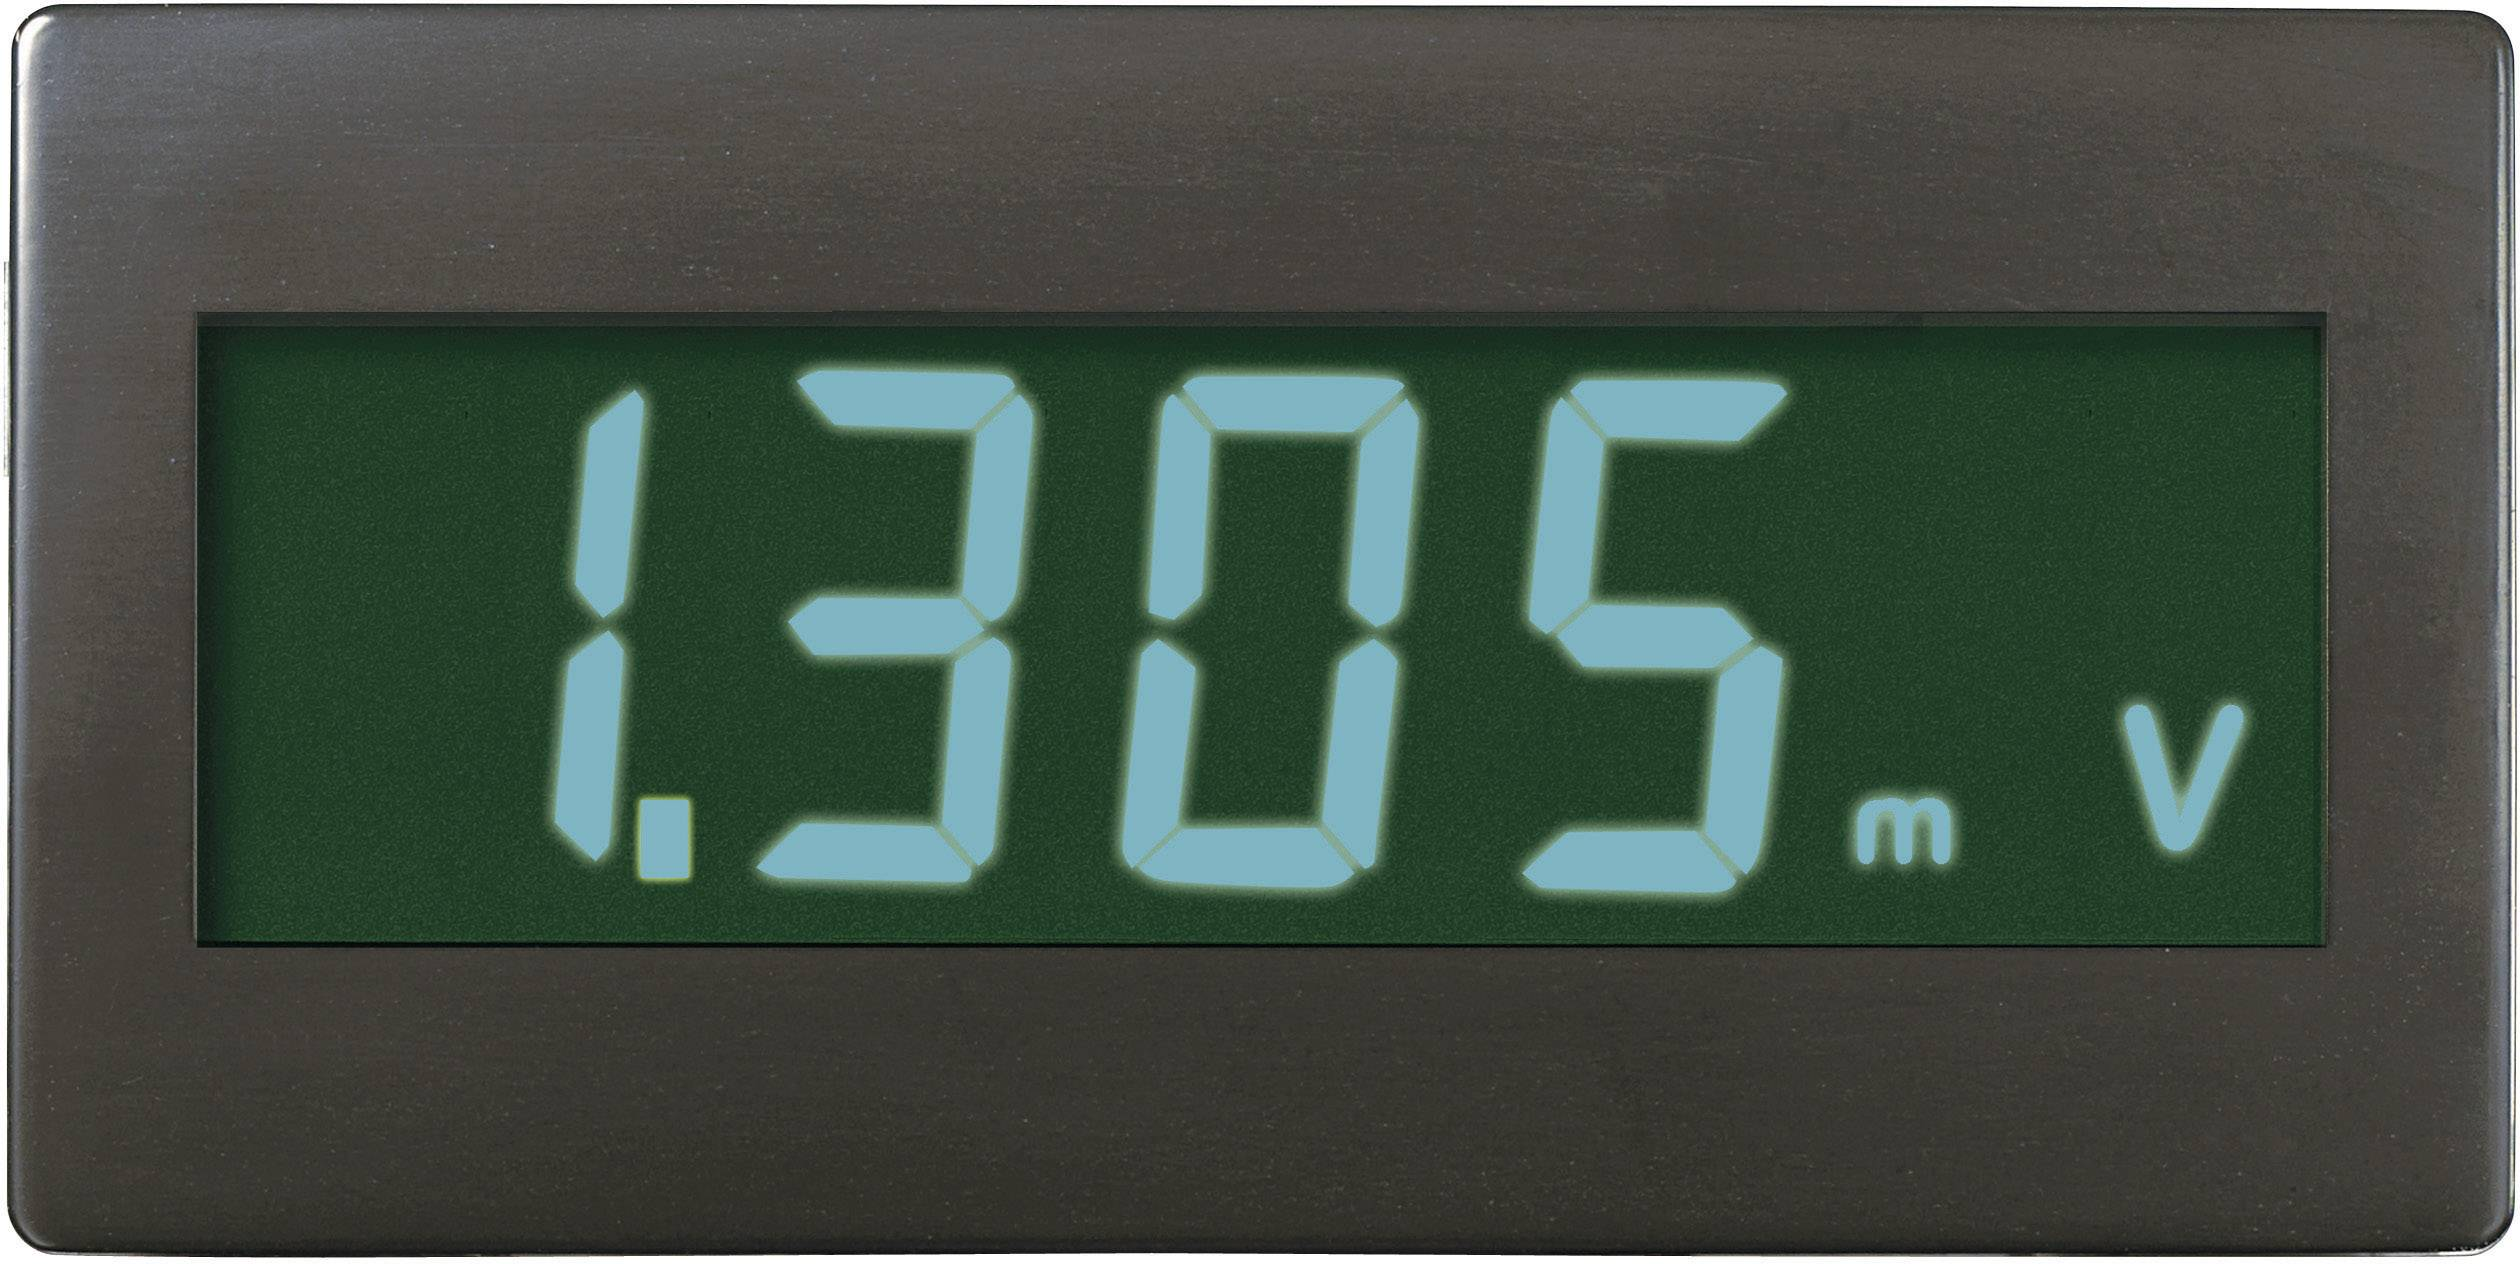 Digitálne panelové meradlo Voltcraft DVM-230GN, 45 x 22